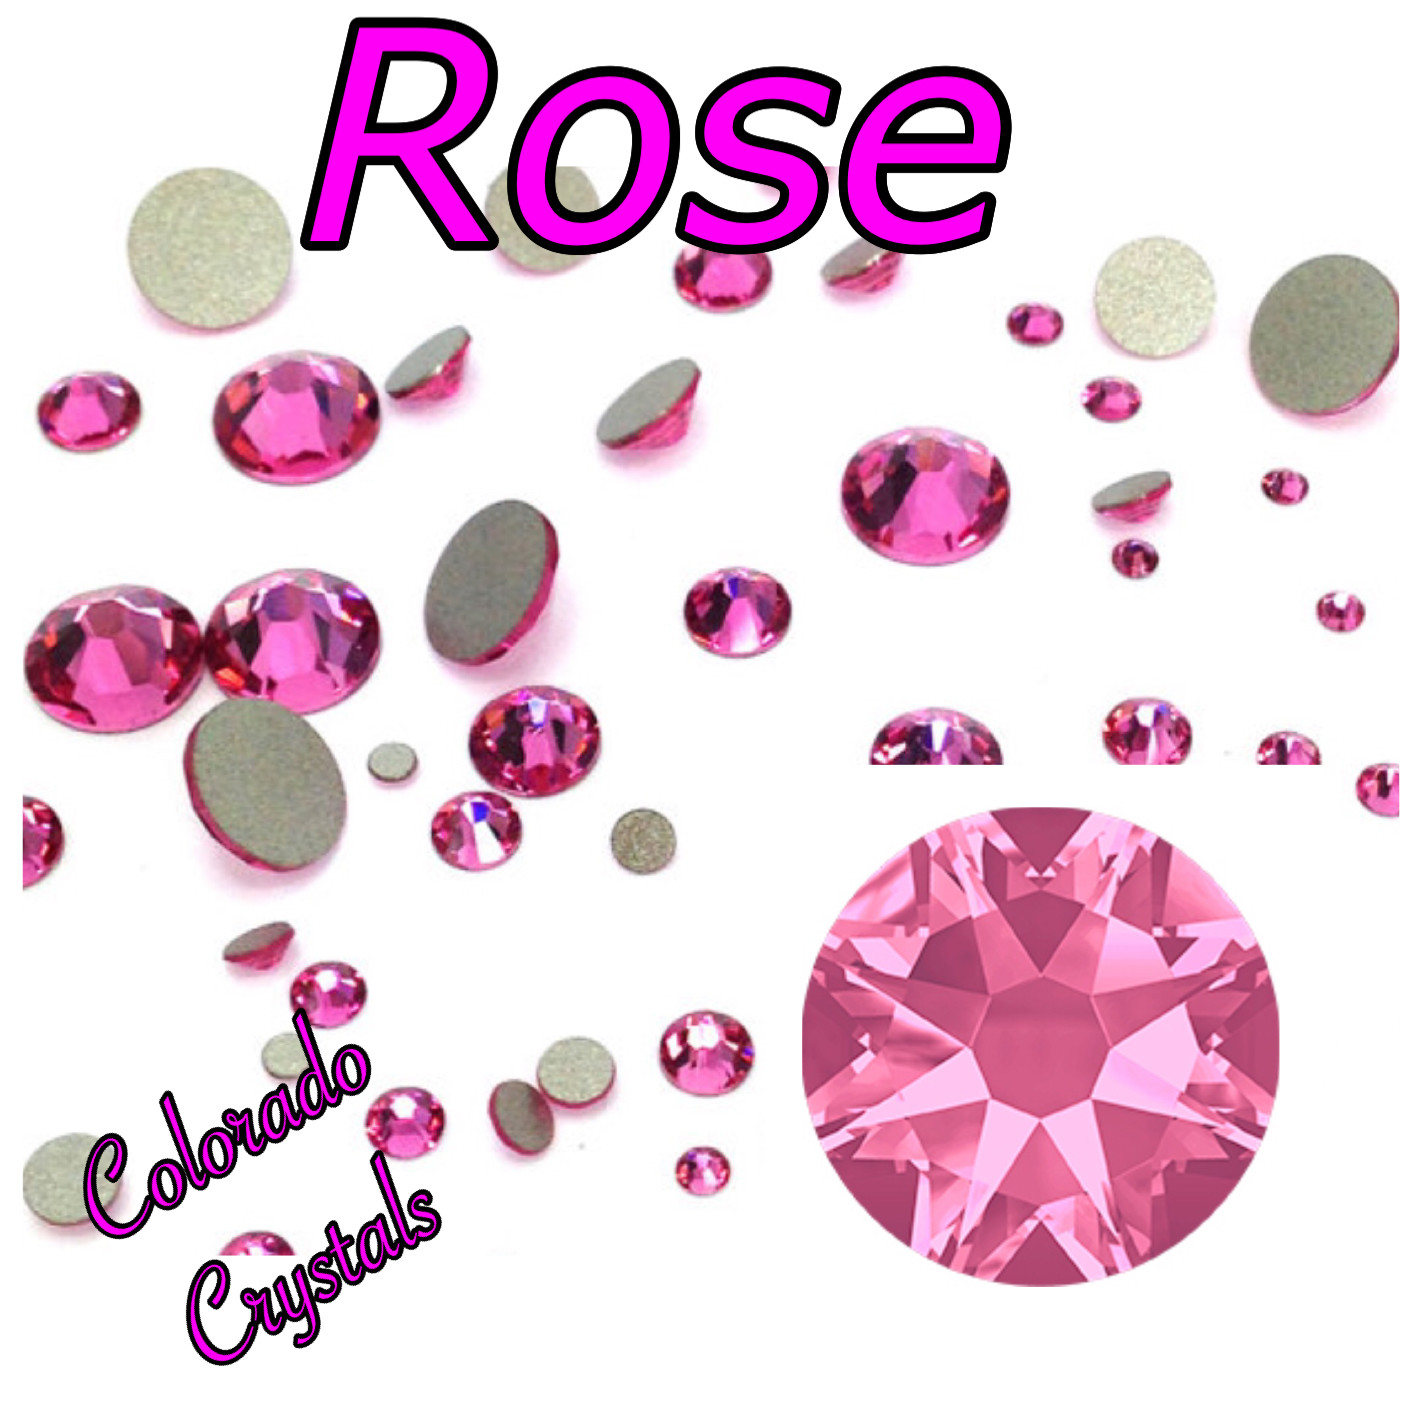 Rose 34ss 2088 Limited Swarovski Large round crystals